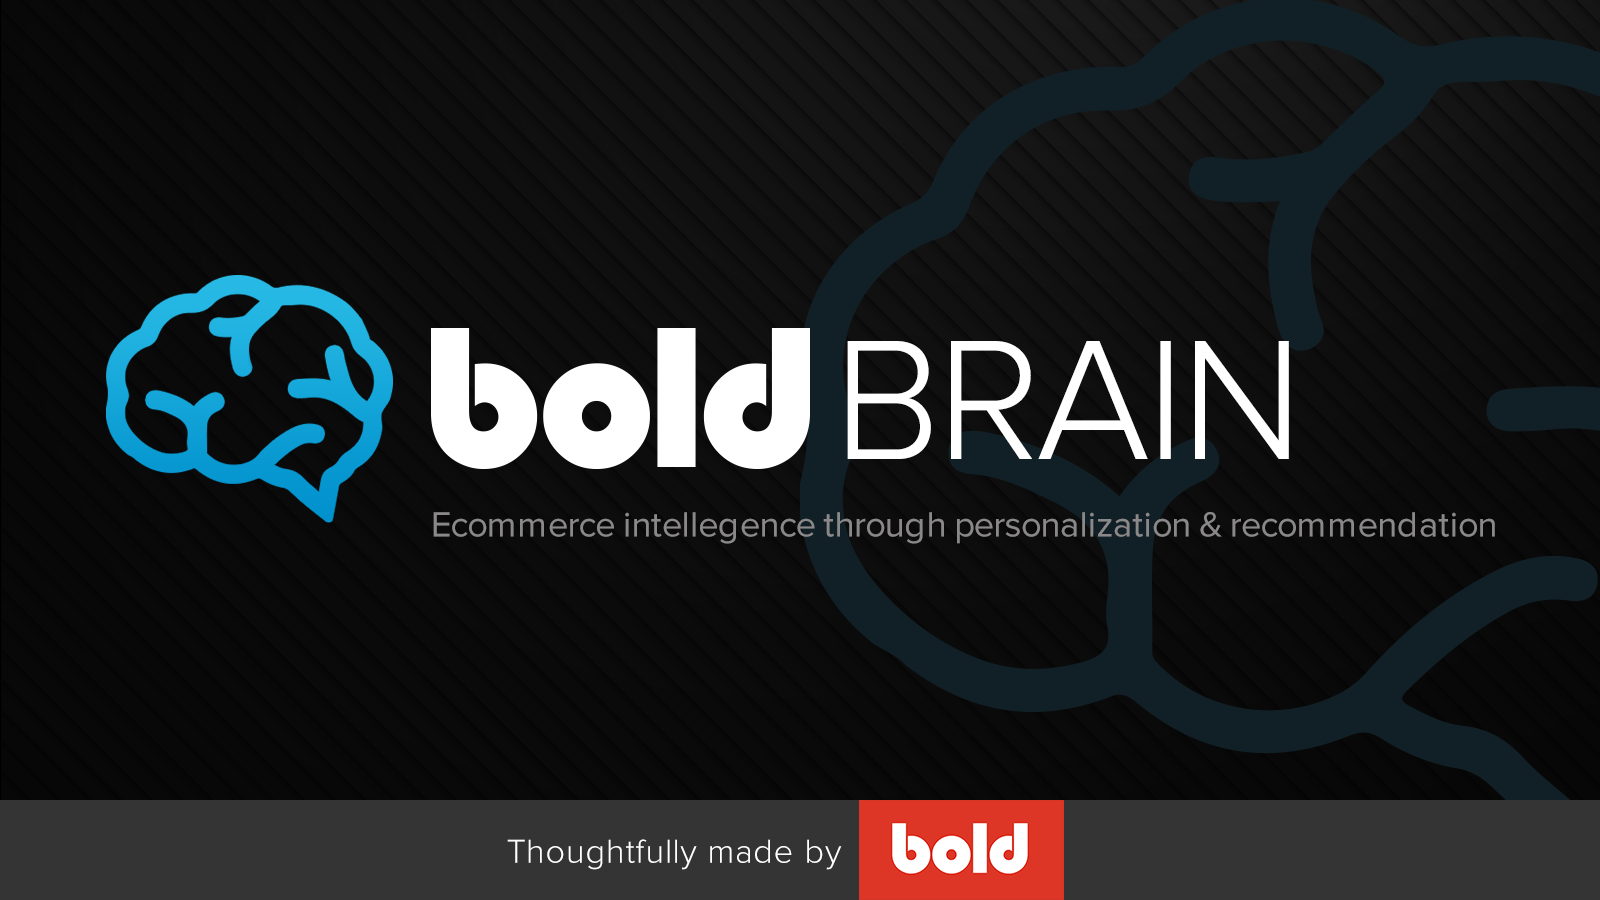 The Bold Brain